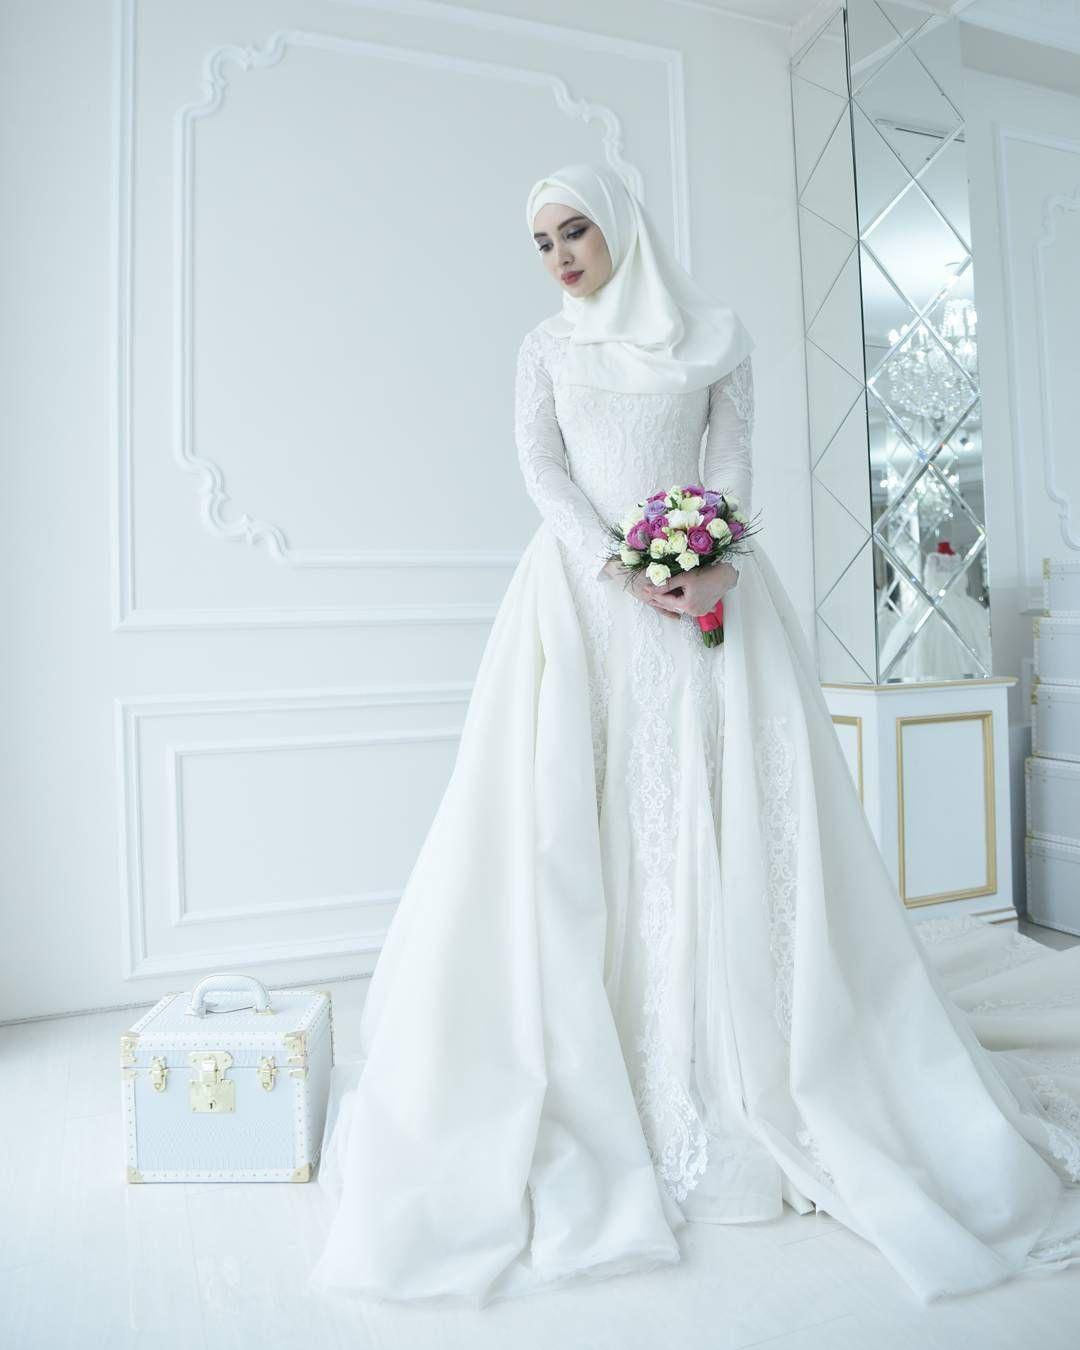 Pin by husanova .. on Хиджаб   Pinterest   Hijab wedding dresses ...